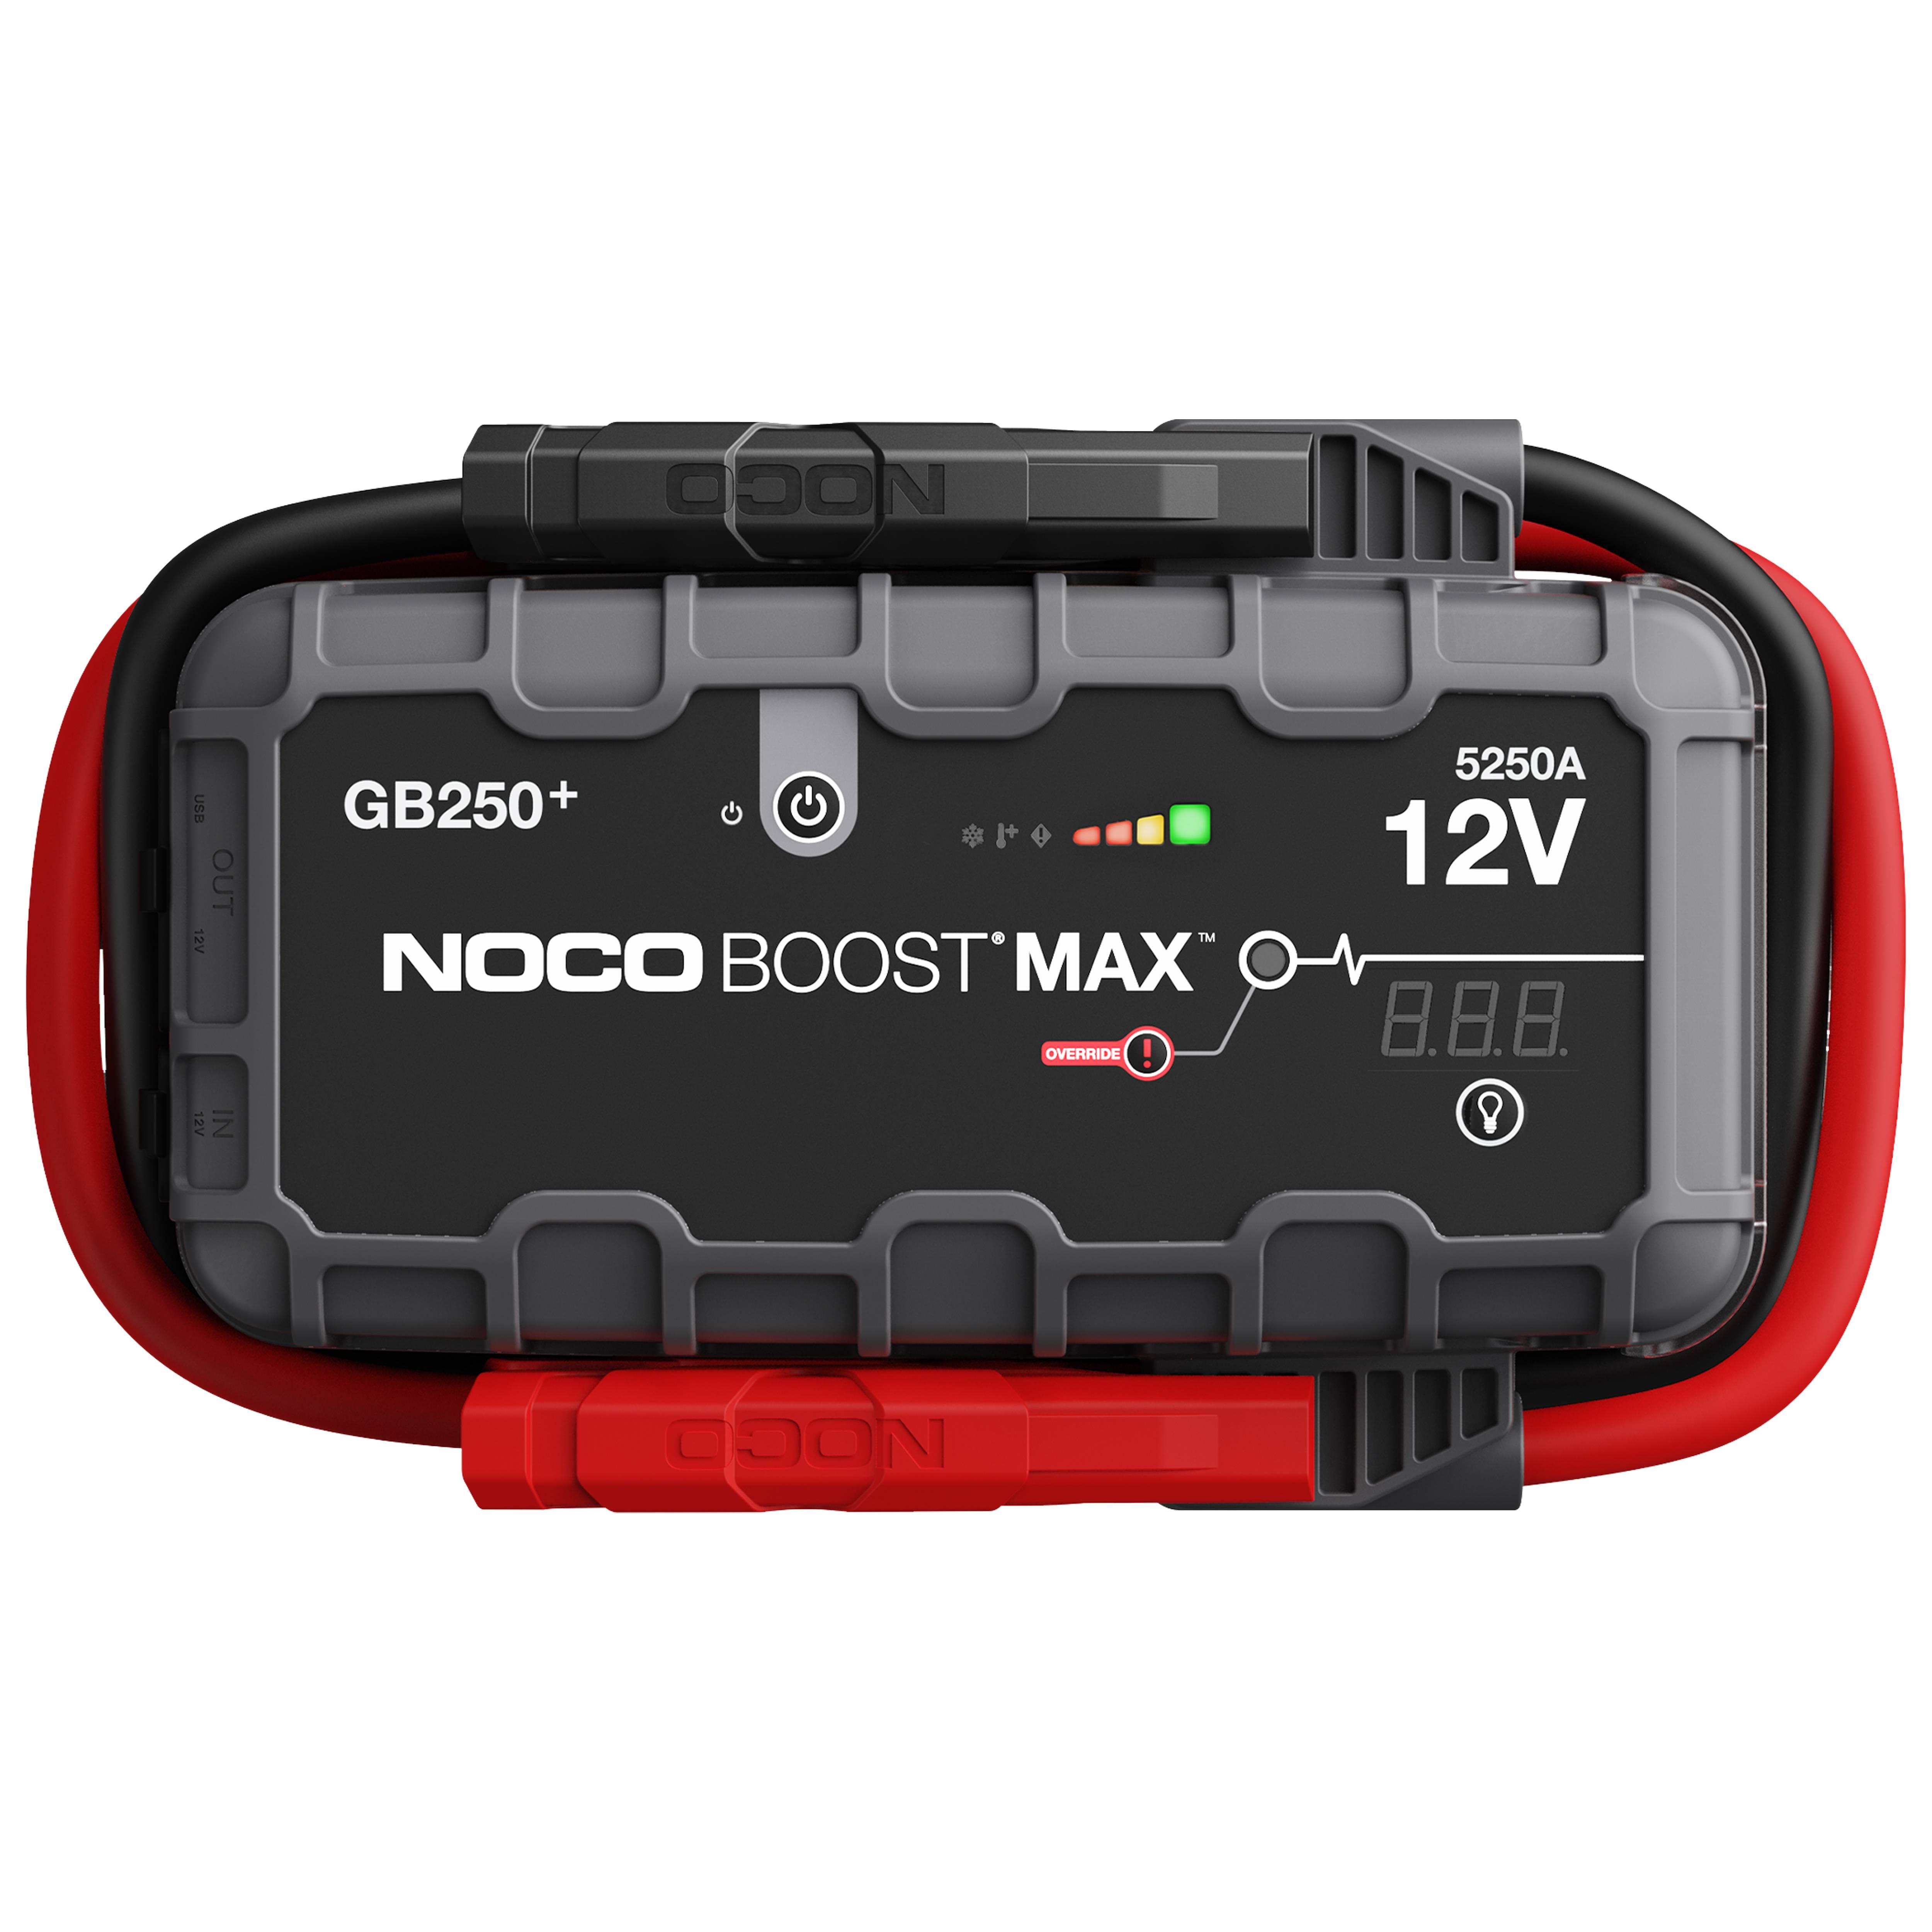 NOCO Boost Max 12V 5250A akkumulátor bikázó